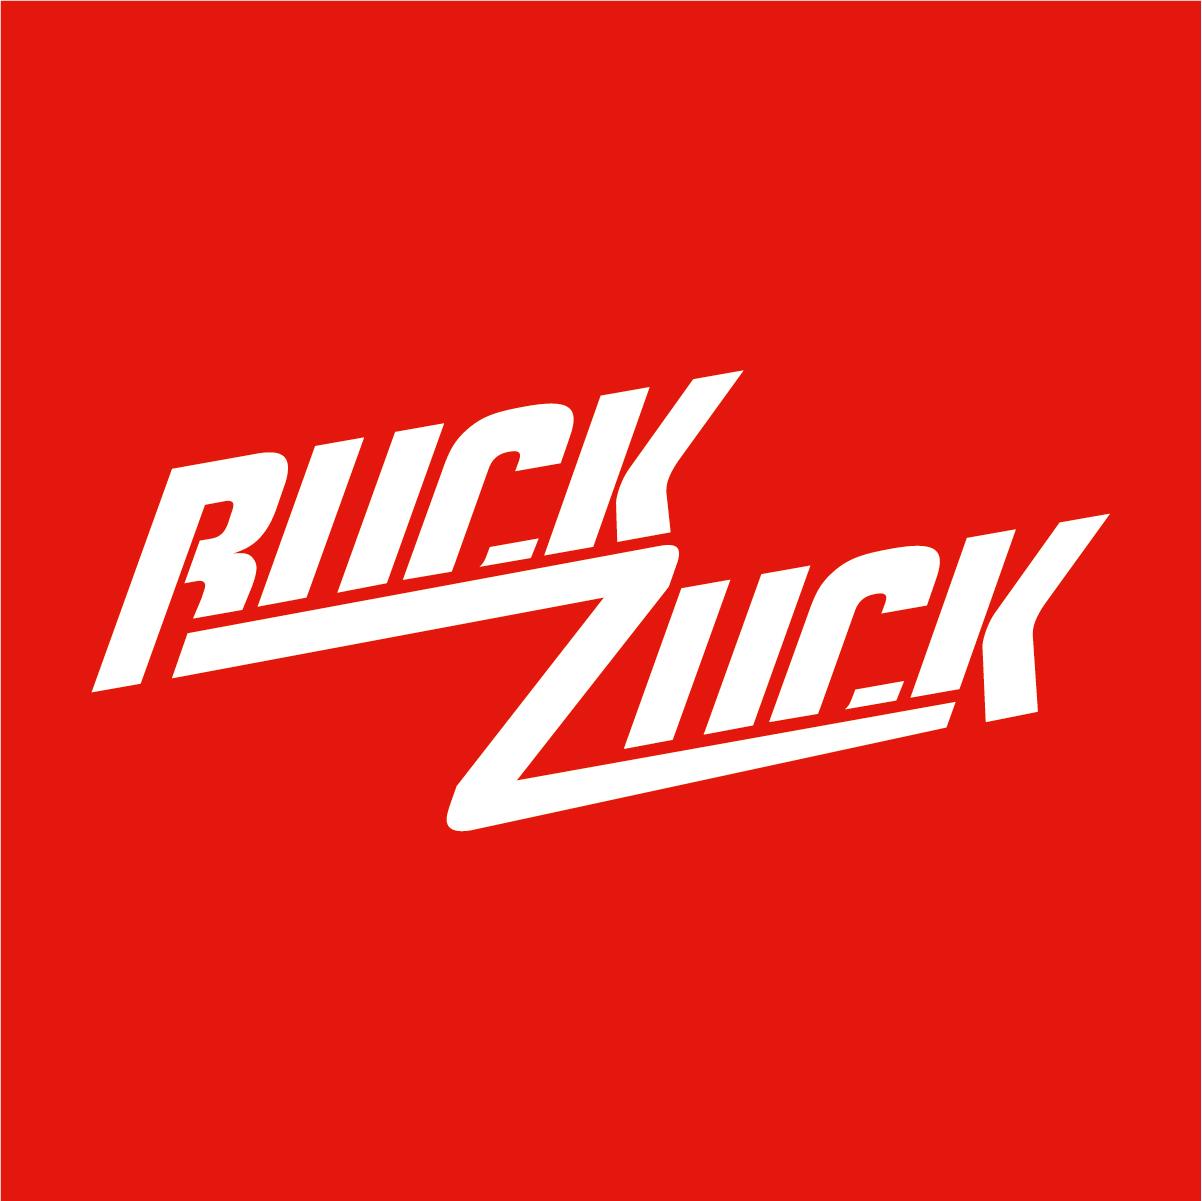 Komplettset Sono Pro Landscape Designboden 4,5mm Sharpstone